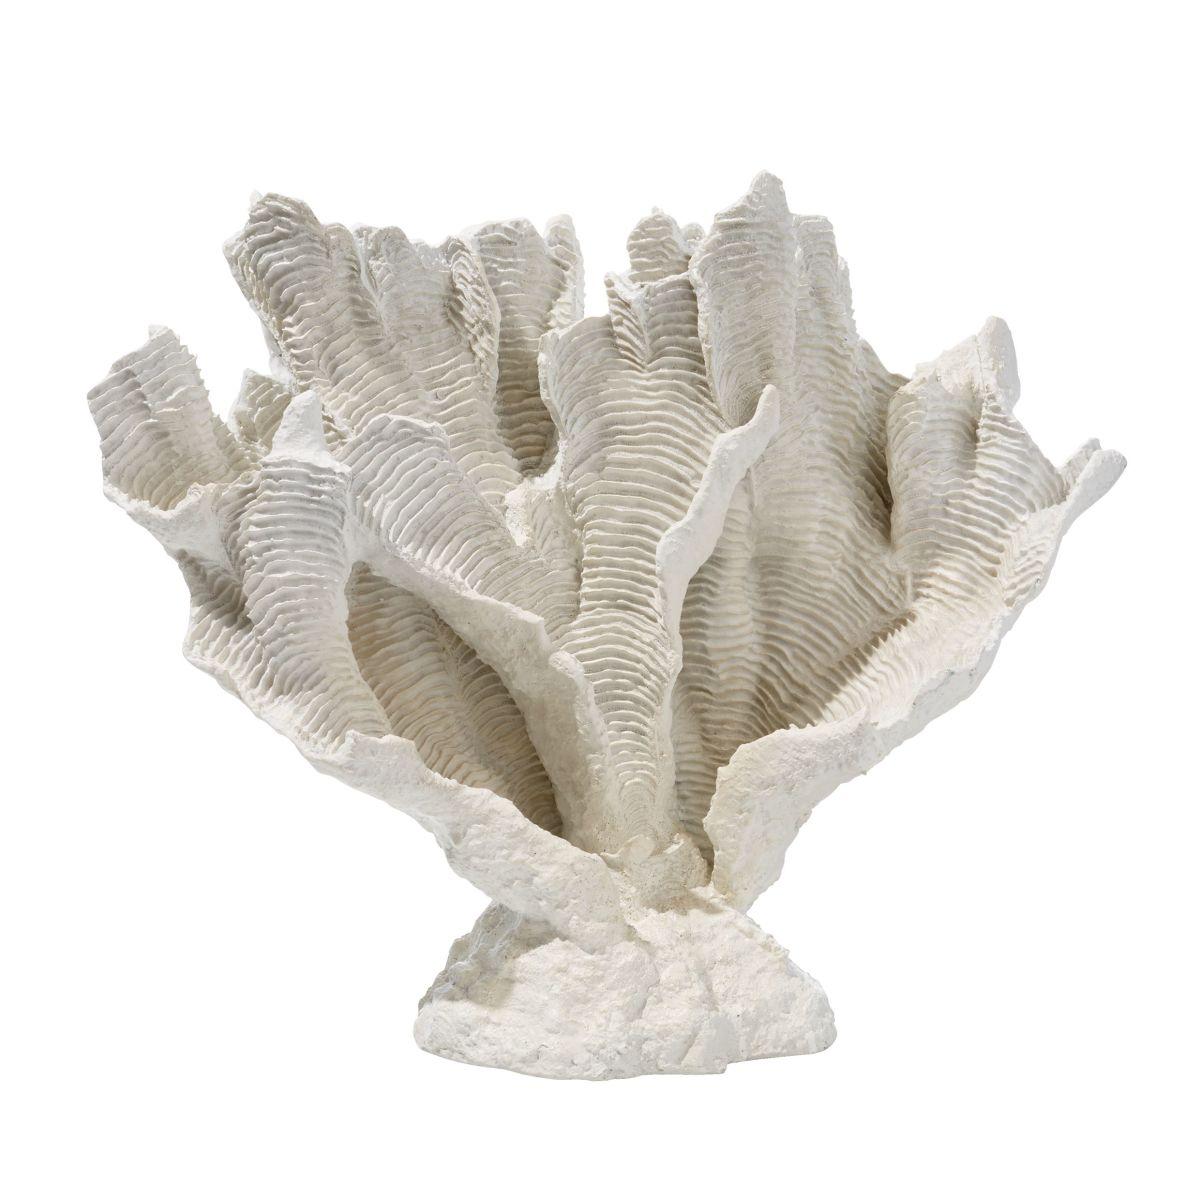 Deko-Objekt Koralle, Polyresin